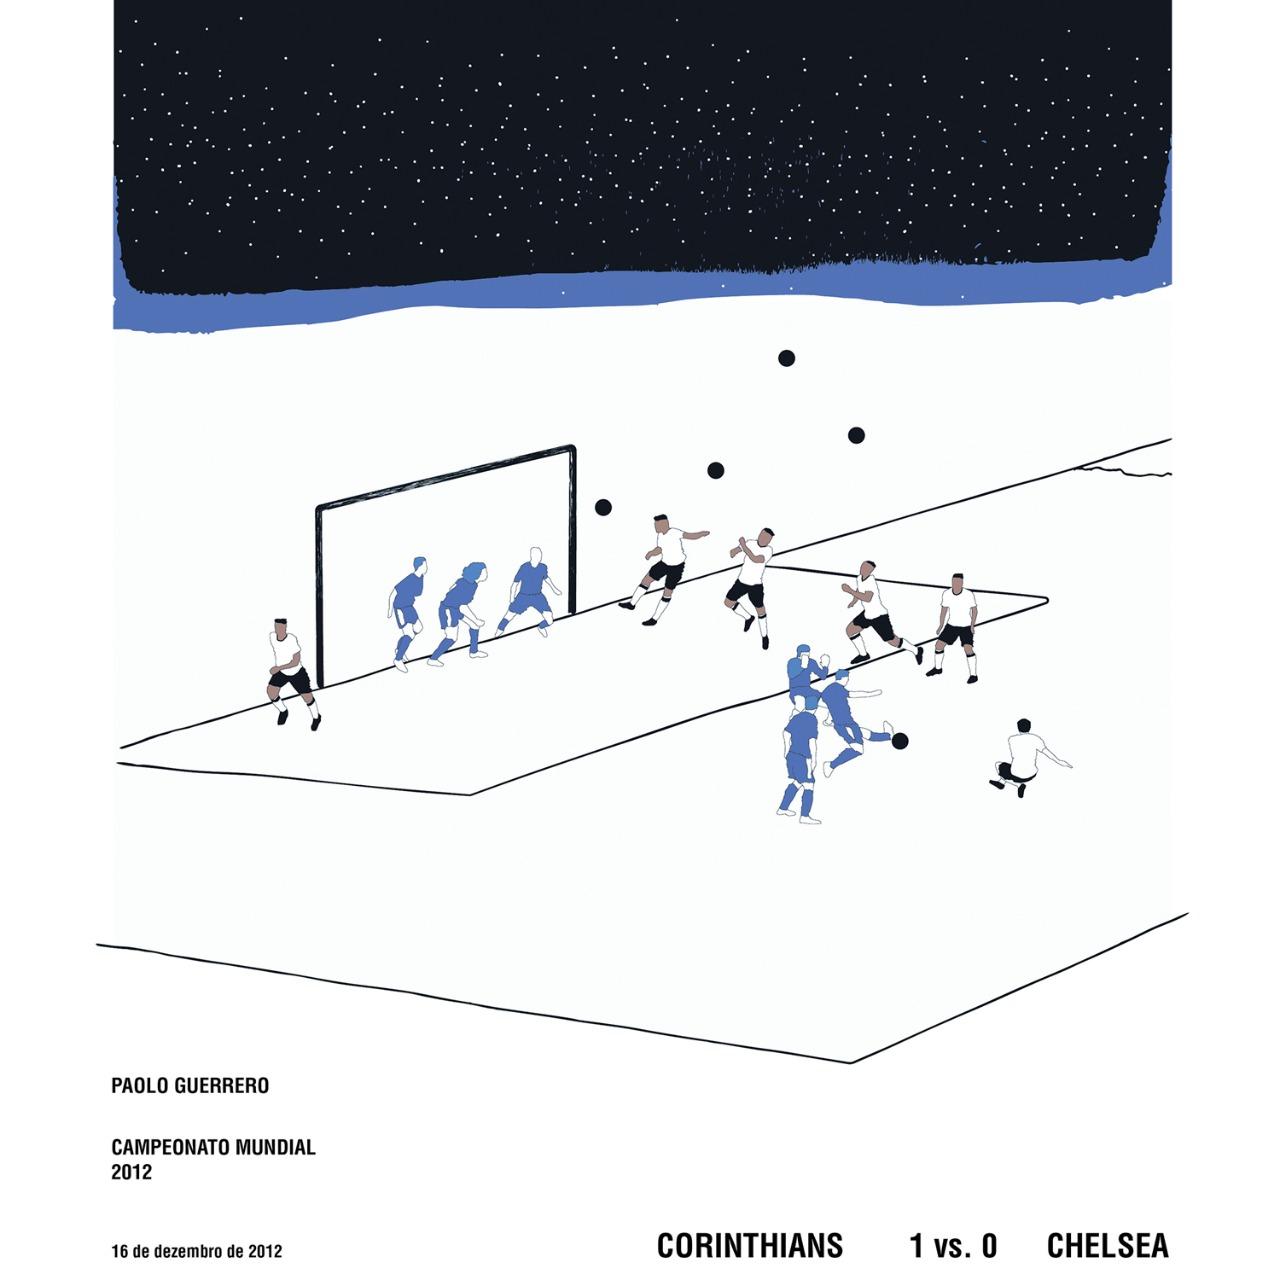 Corinthians - Campeonato Mundial 2012